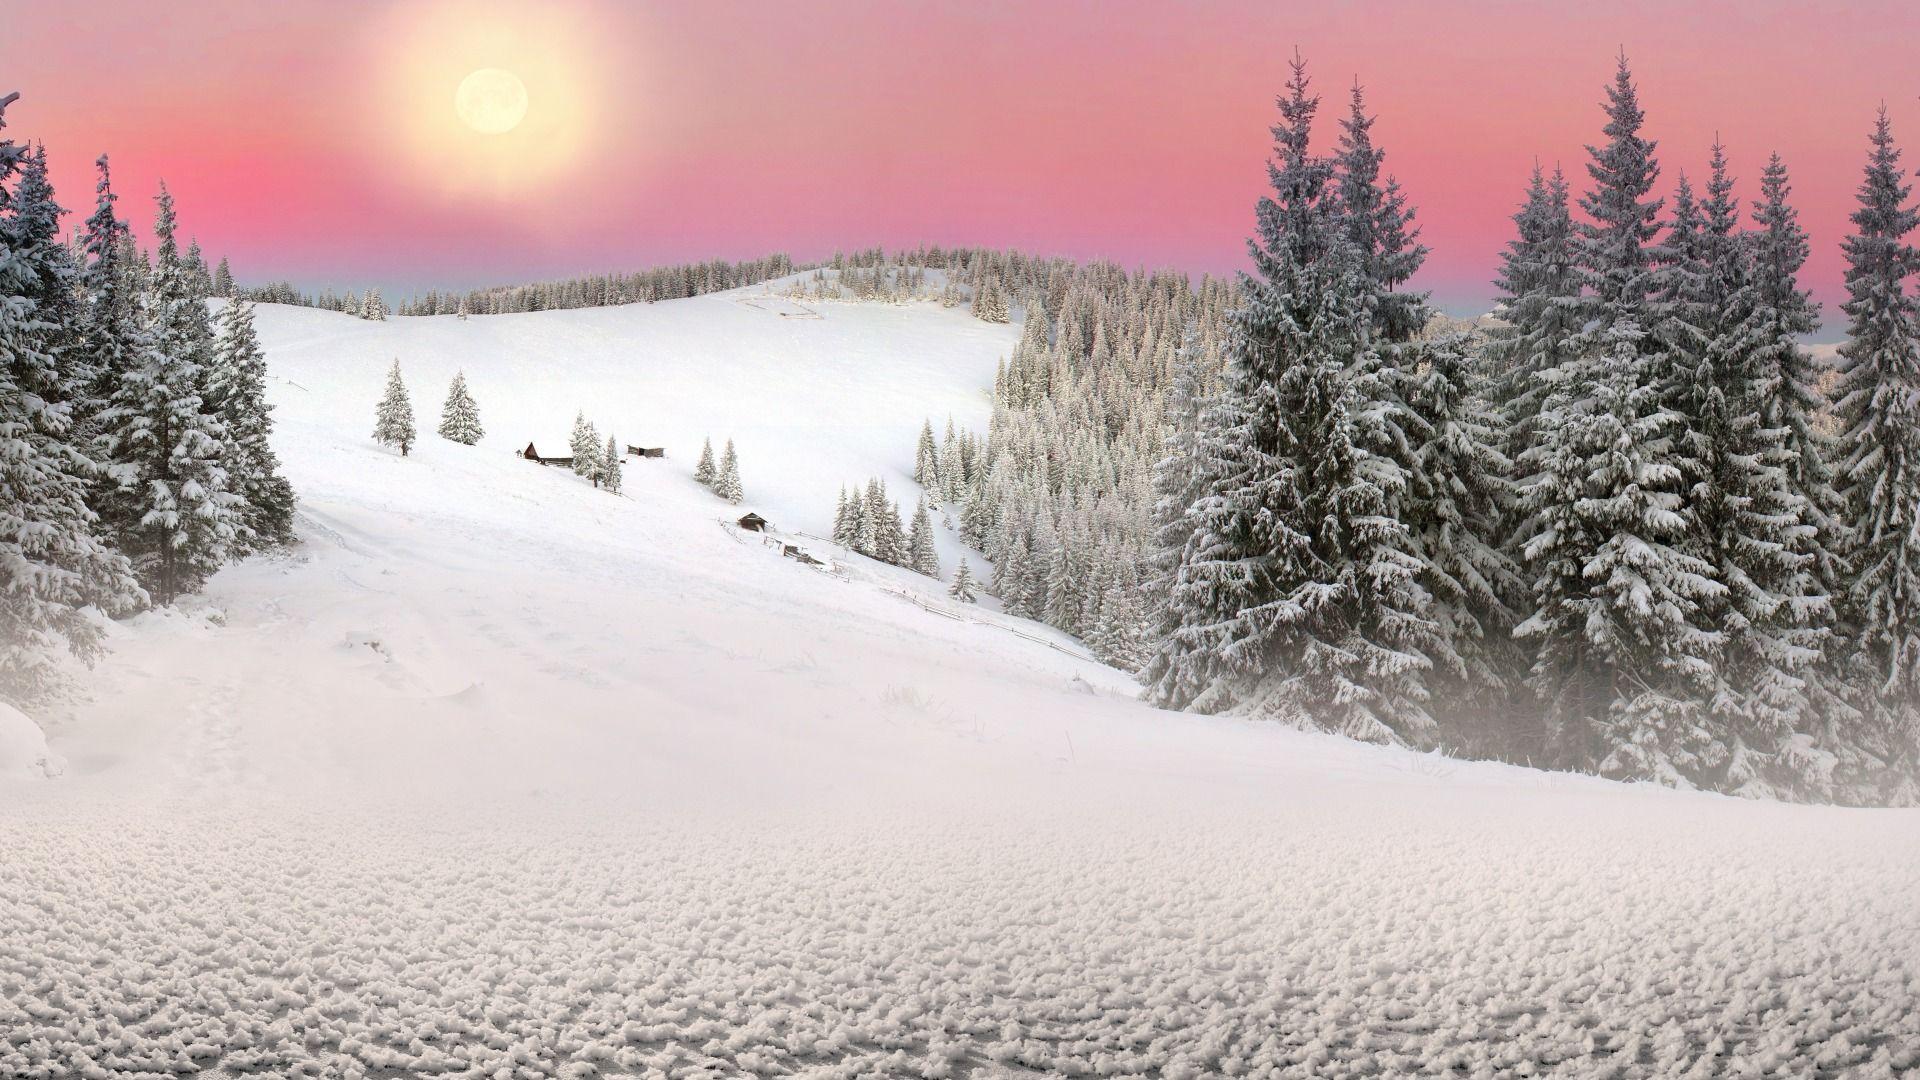 Download Wallpaper The Sun Nature Winter Snow Spruce Ukraine Carpathians Transcarpathia Section Priroda Resolution 1920x1080 Bilder Abendrot Schnee Sunset forest snow winter spruce trees